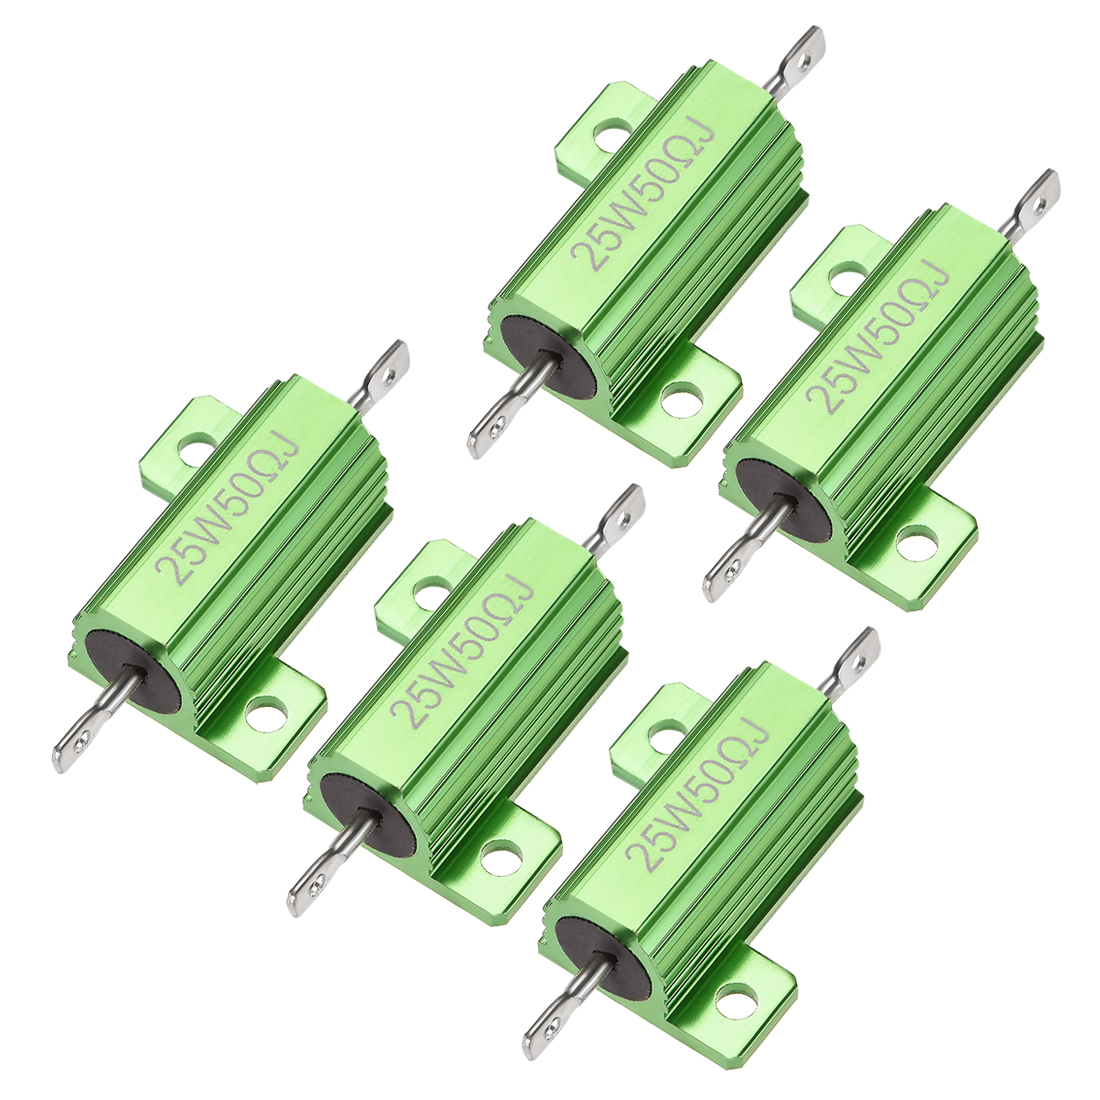 25W 50 Ohm 5% Aluminum Housing Resistor Wirewound Resistor Green Tone 5 Pcs